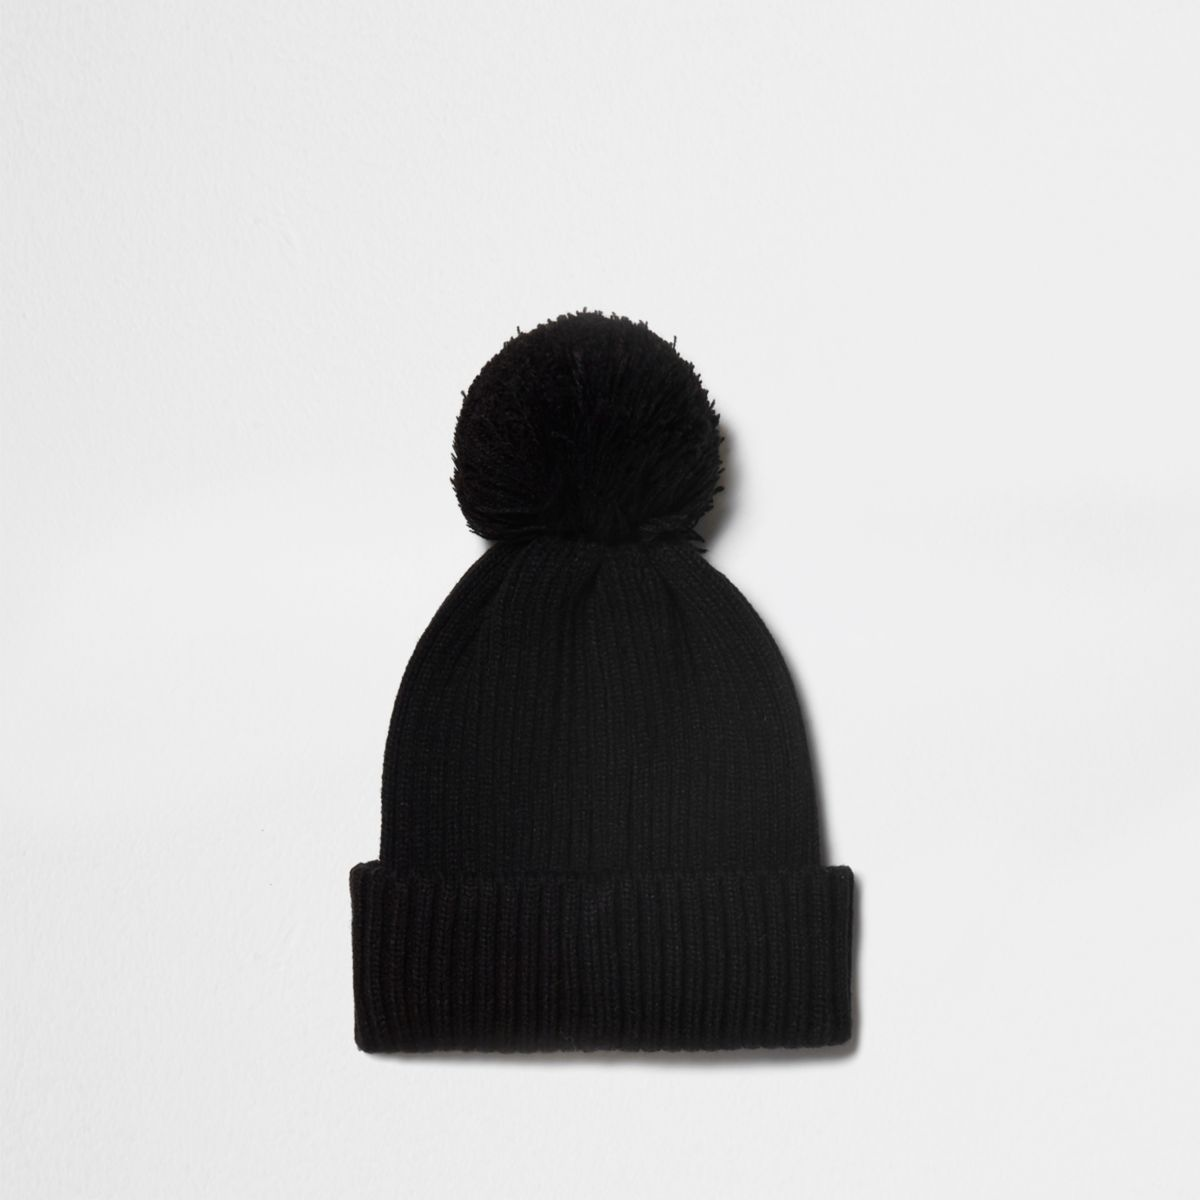 Black ribbed knit bobble beanie hat